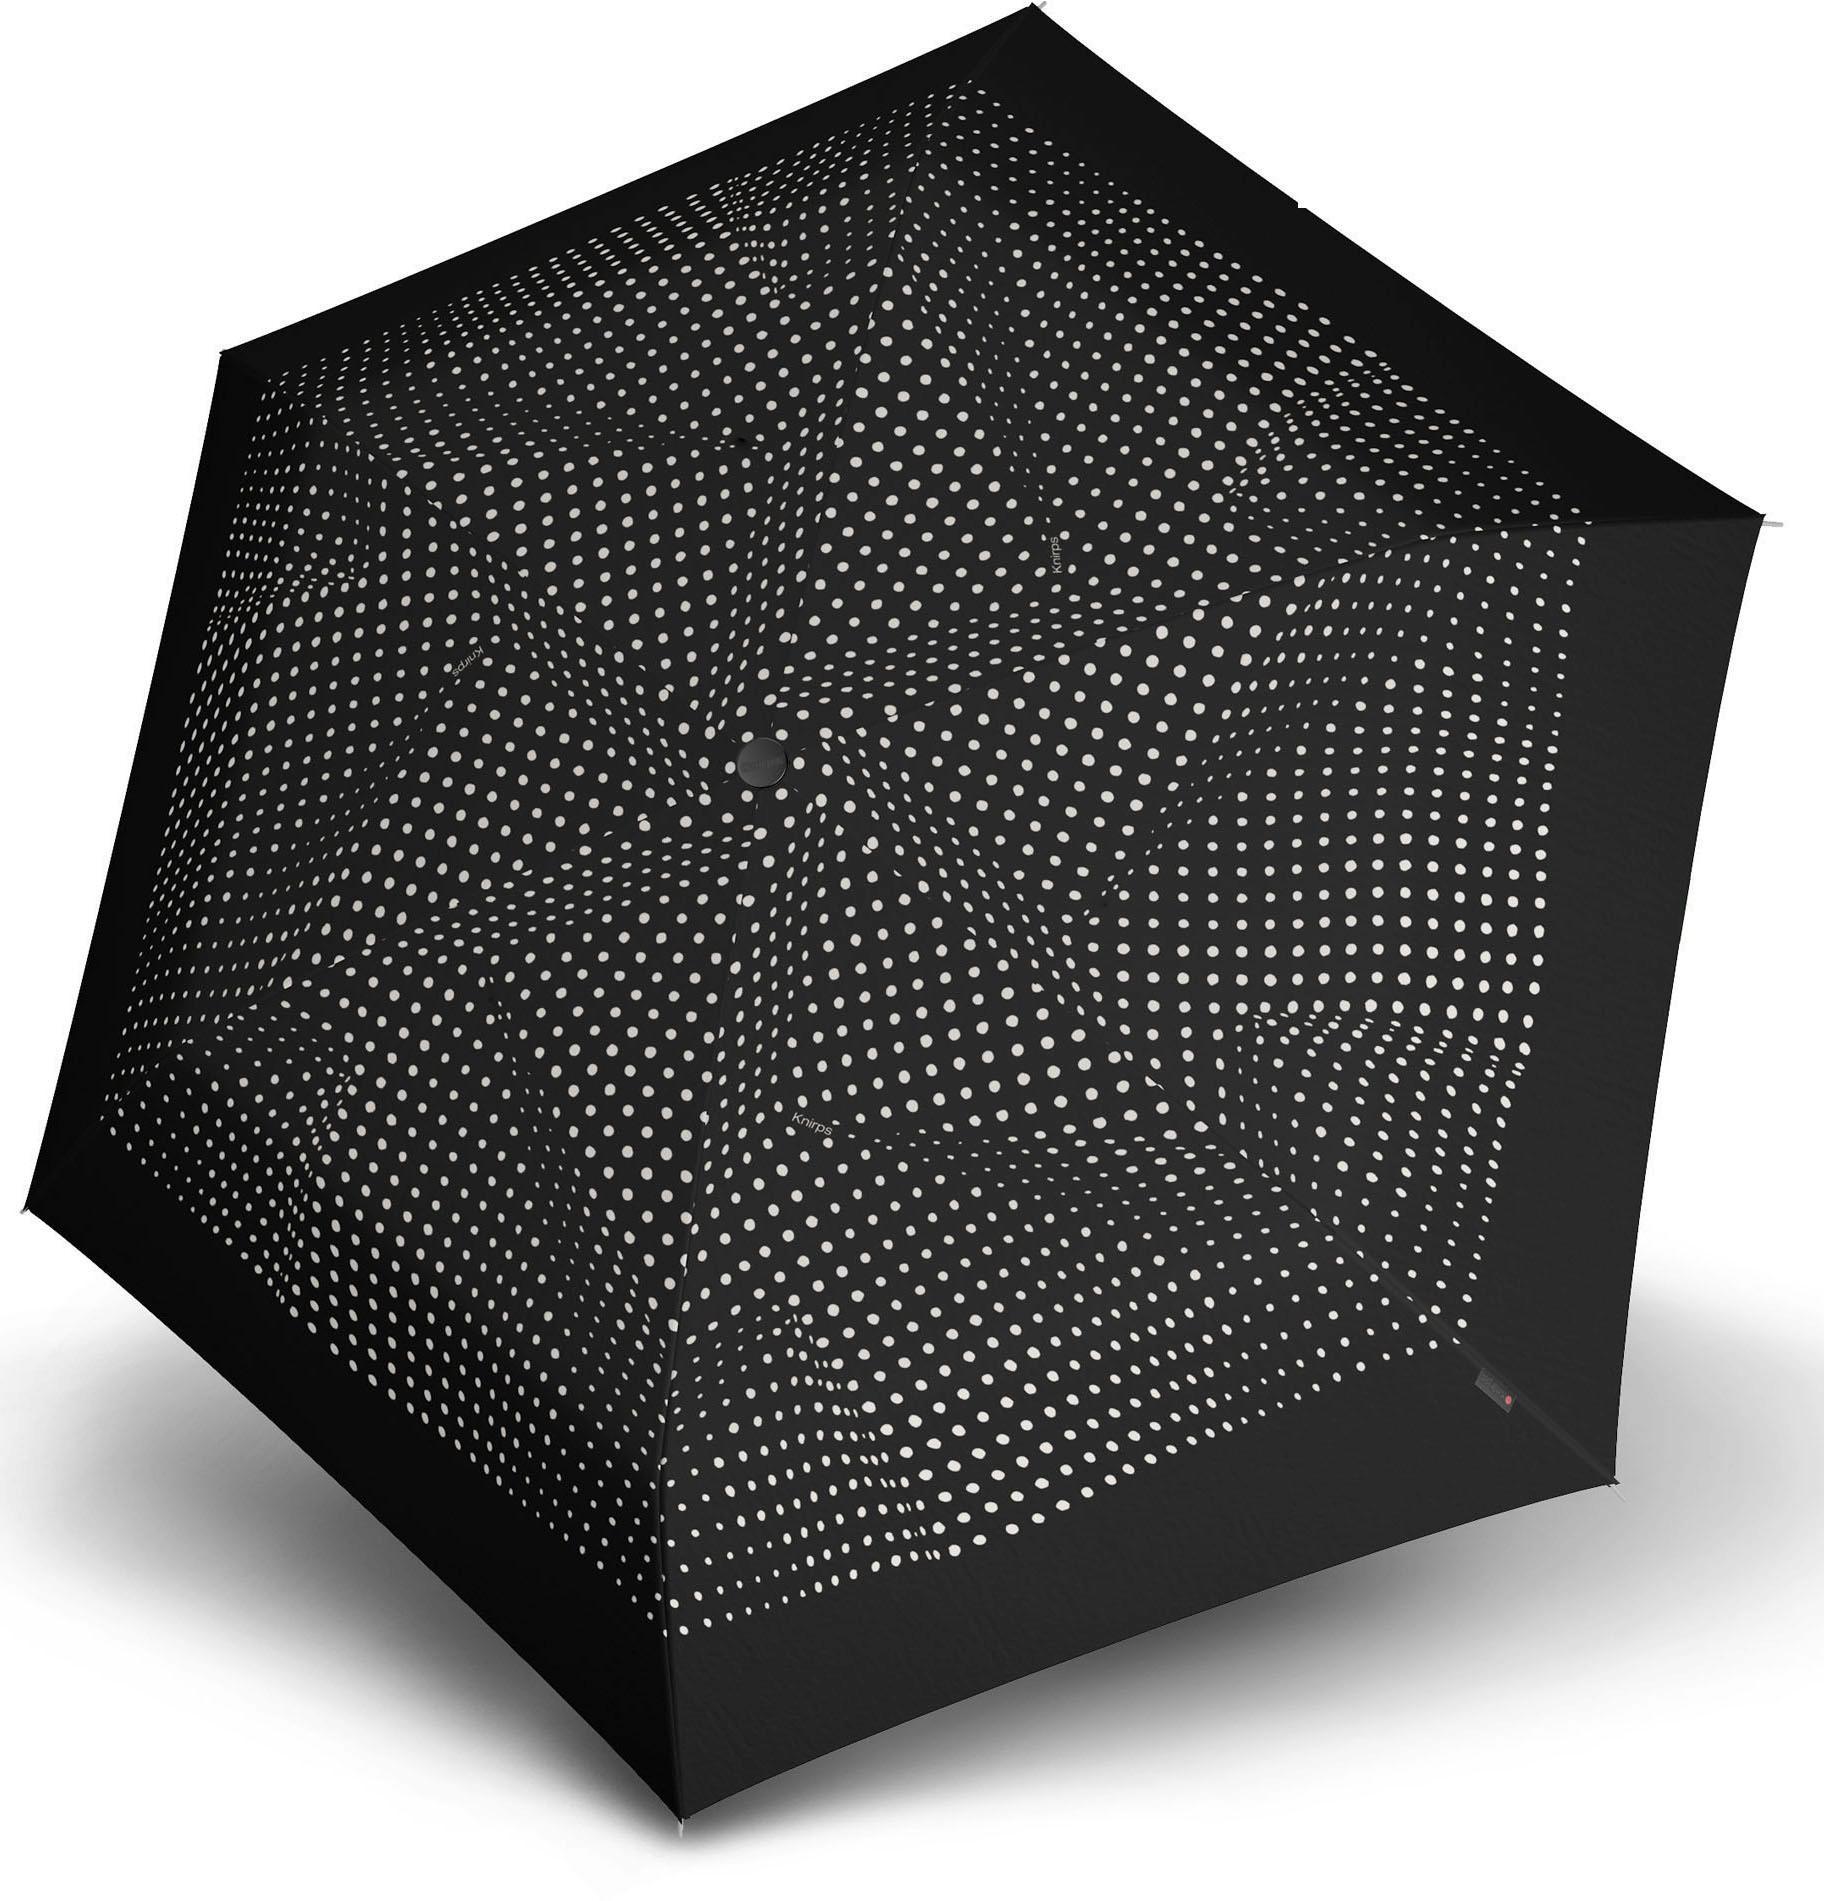 Knirps® Regenschirm - Taschenschirm, »TS.200 Slim Medium Duomatic bolero black/ecru« | Accessoires > Regenschirme > Taschenschirme | Schwarz | Wo | KNIRPS